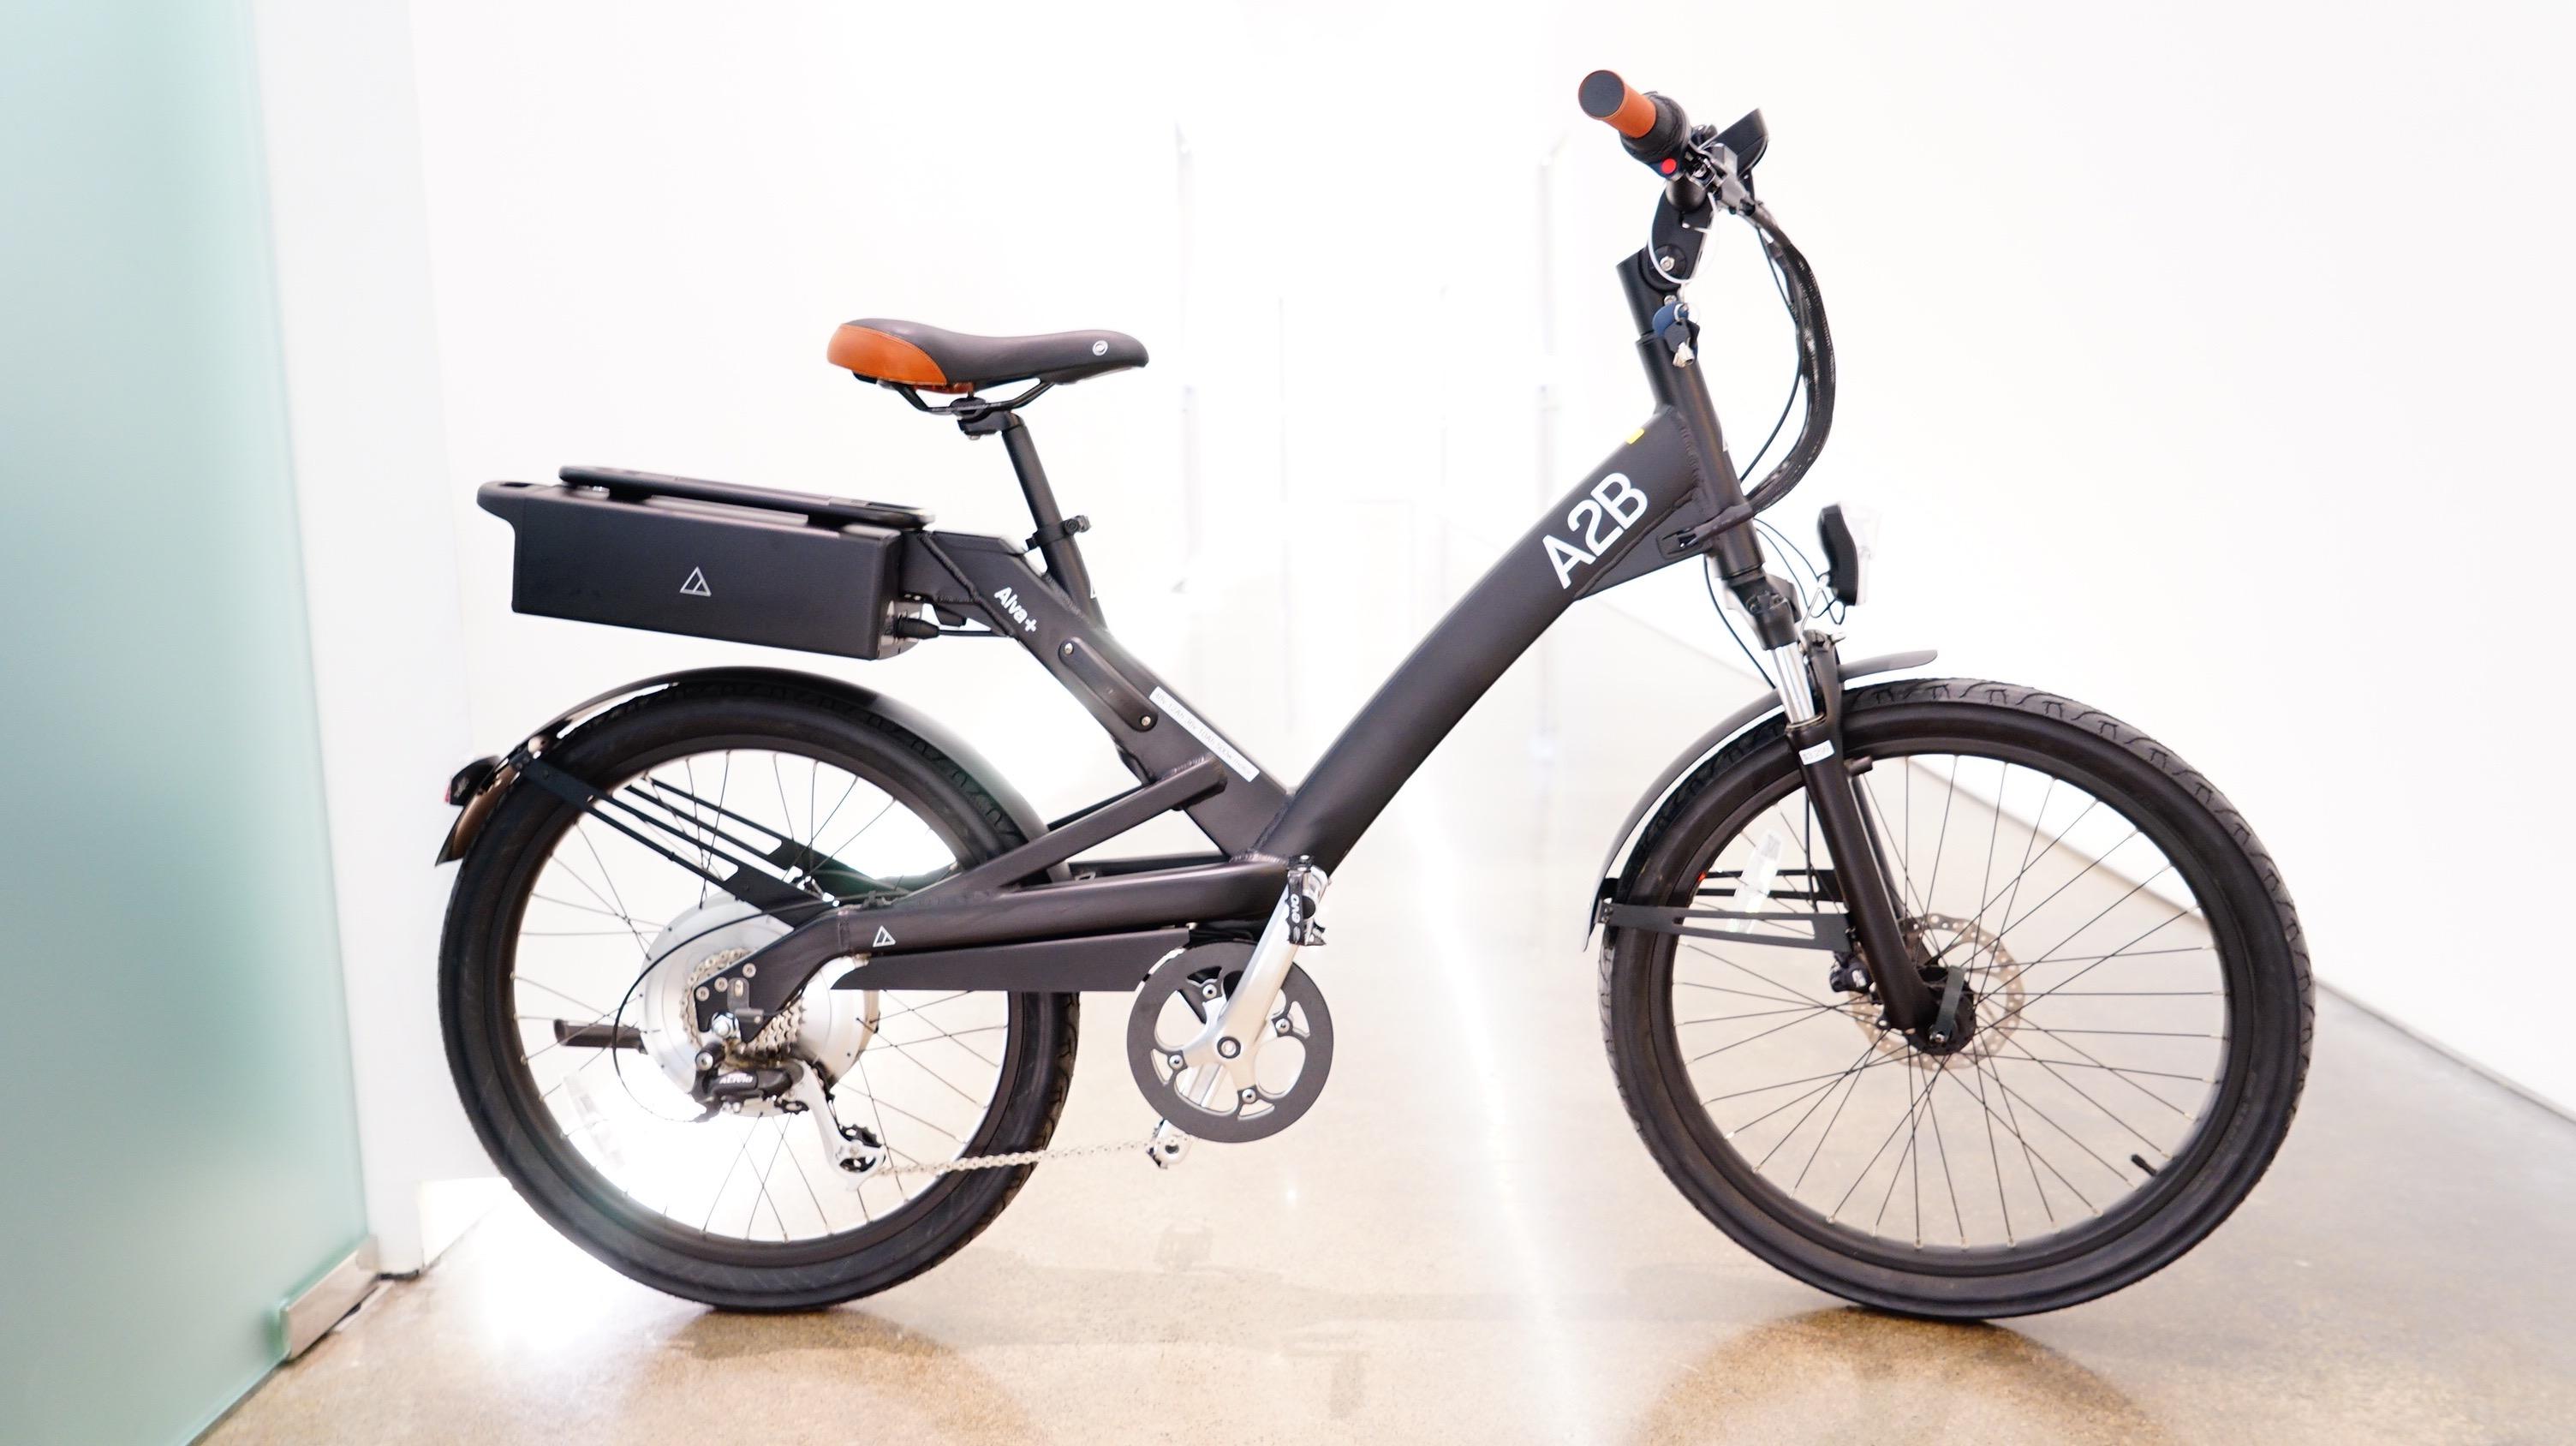 A2b Electric Bike >> Alva A2b E Bike Electric Bicycle Pedalpusher